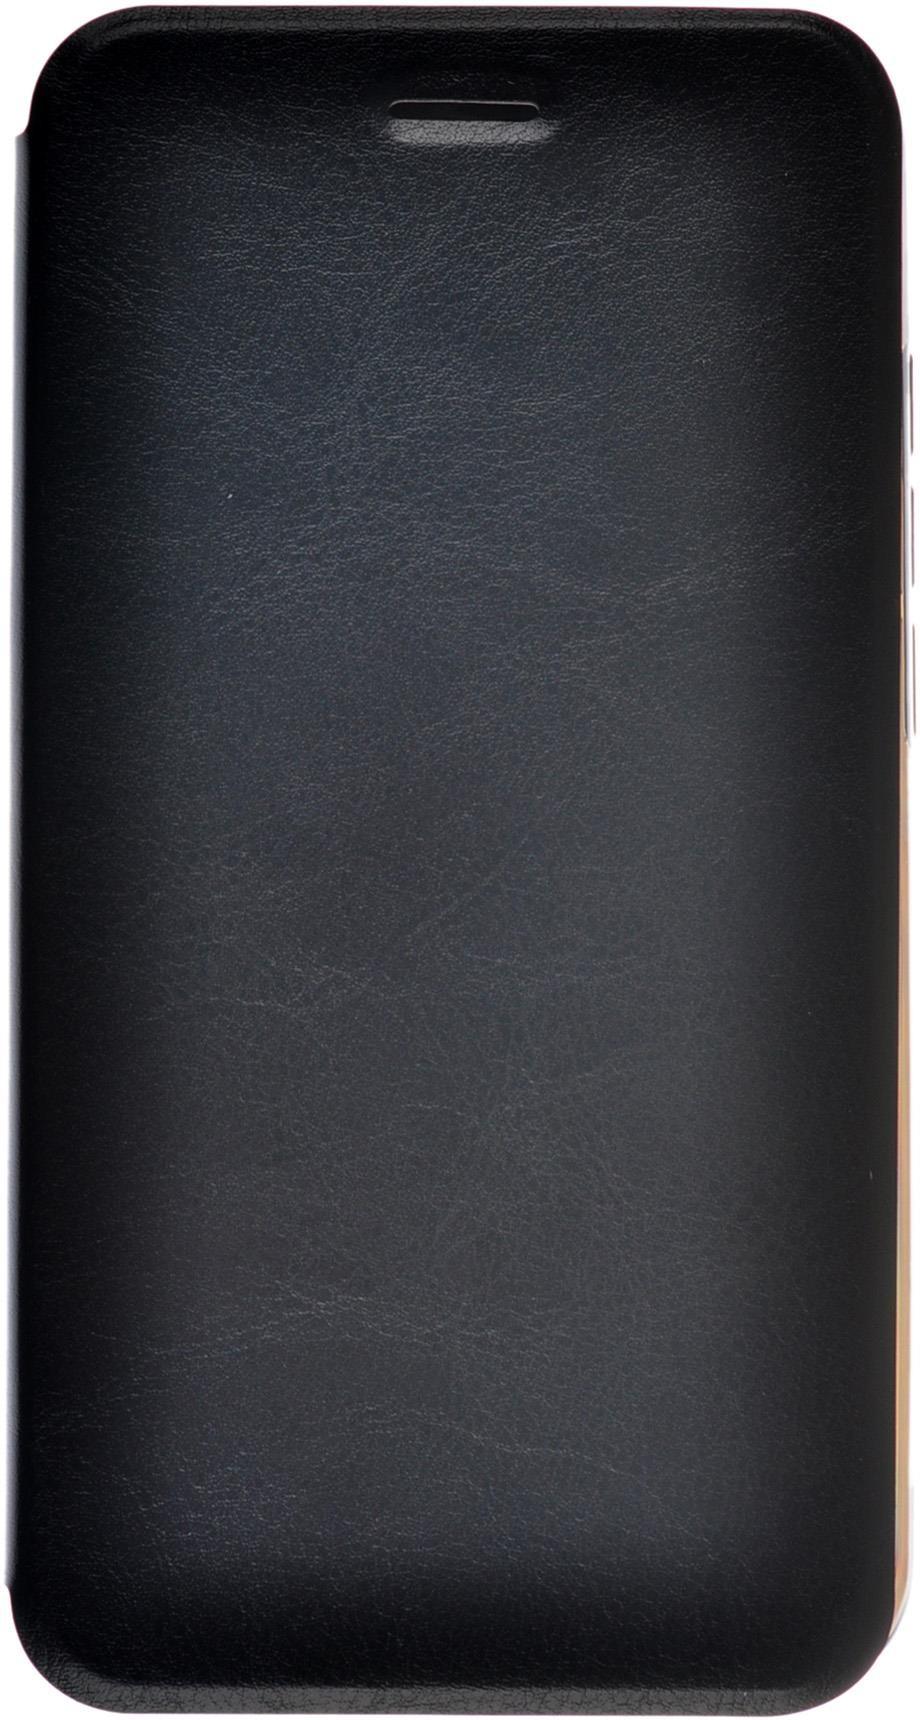 Чехол Skinbox Lux для Micromax Canvas Spark 2 Q391, 2000000078496, черный чехол книжка micromax mmx q3551 черный